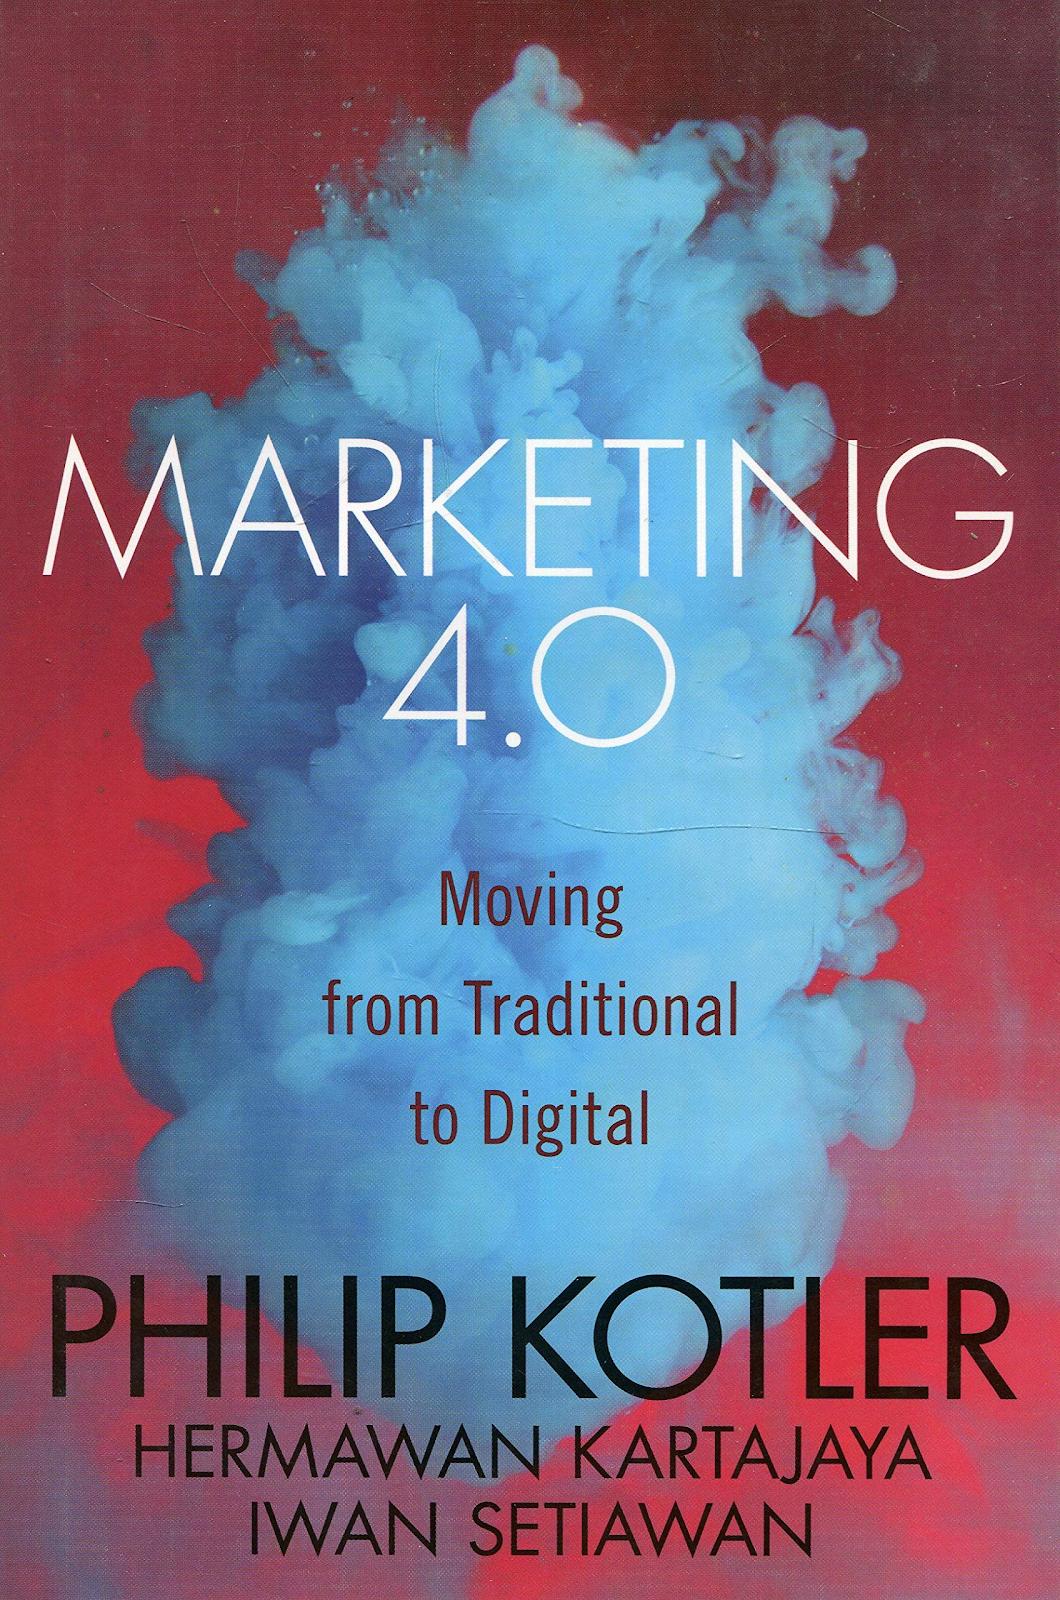 Livro Marketing 4.0